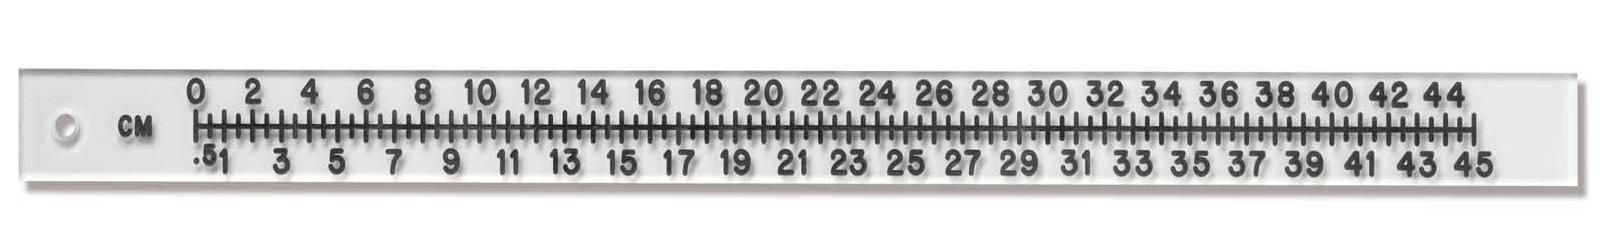 Rigid Acrylic Radiopaque Extremity Ruler - 45cm